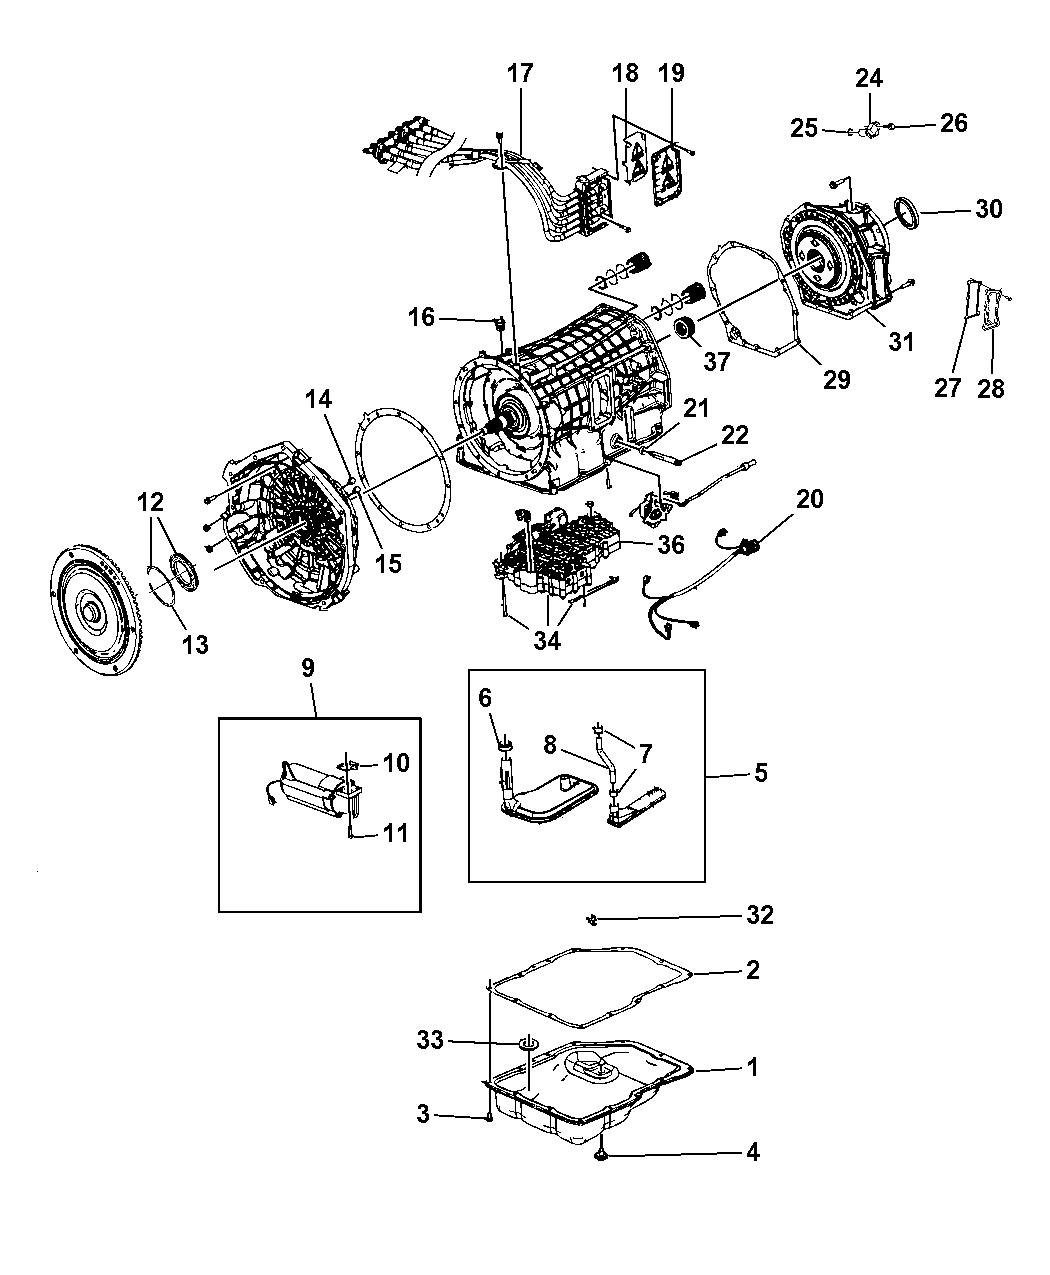 2009 Chrysler Aspen Transmission Serviceable Parts